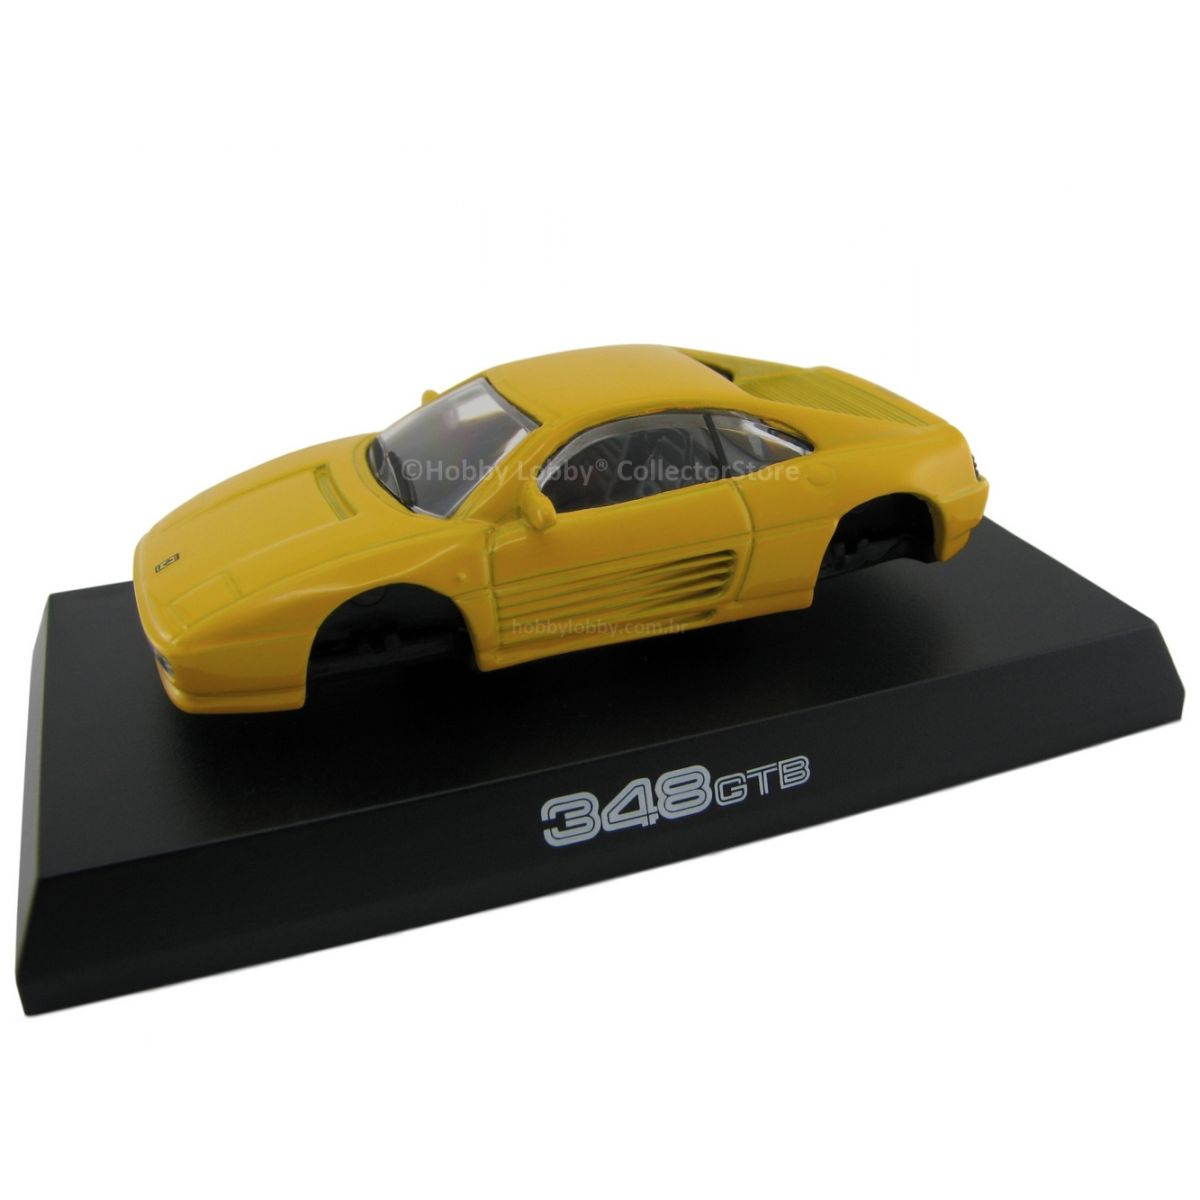 Kyosho - Ferrari Minicar Collection II - Ferrari 348 GTB (Amarela)  - Hobby Lobby CollectorStore